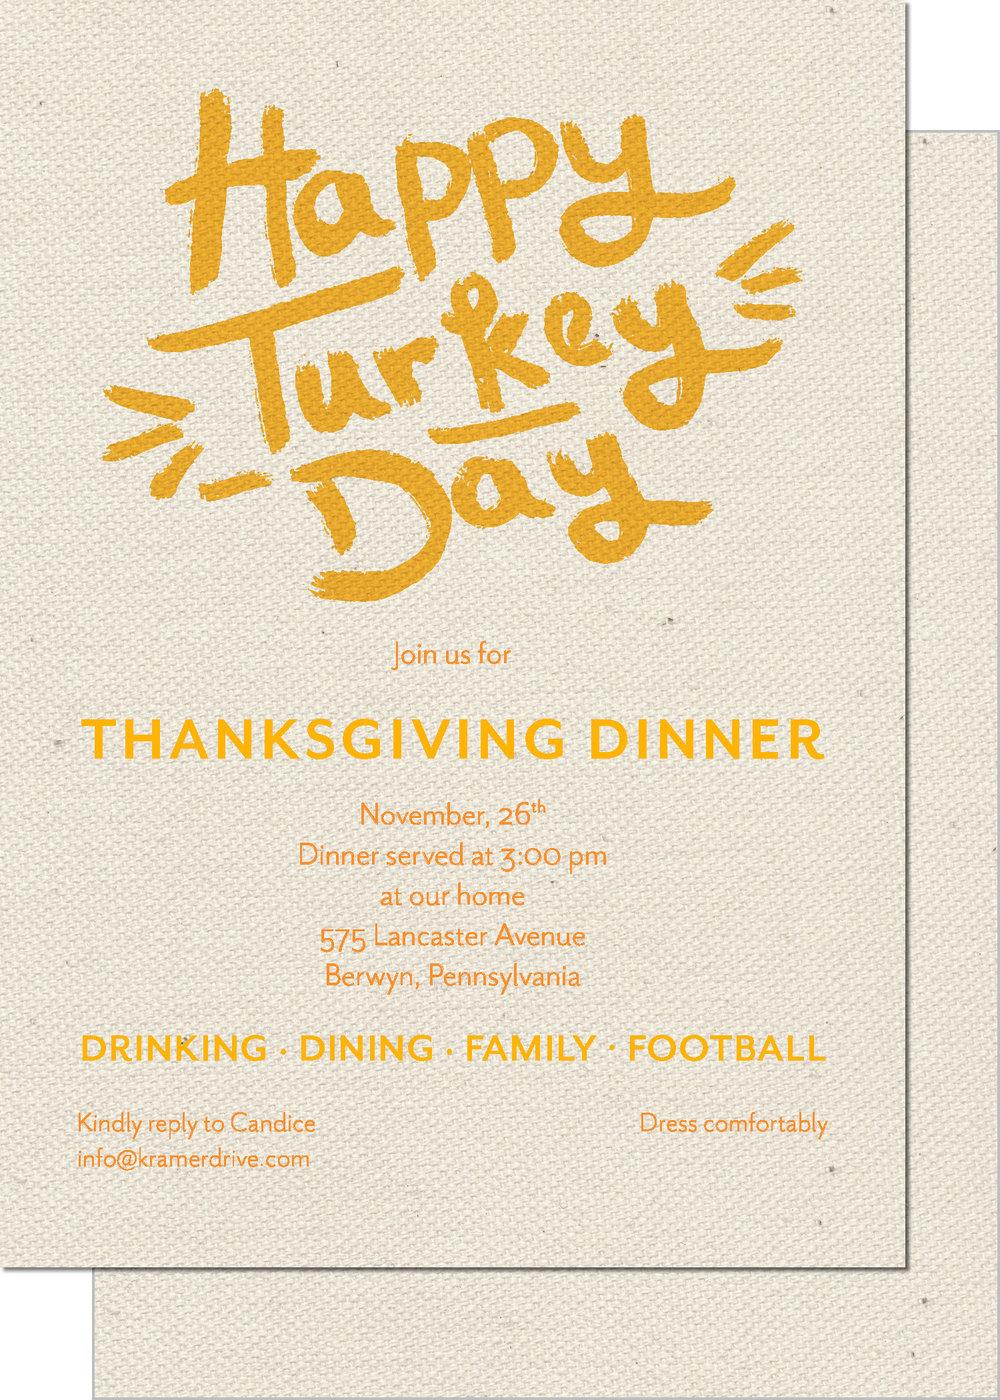 KD9103IN-PB Turkey Day